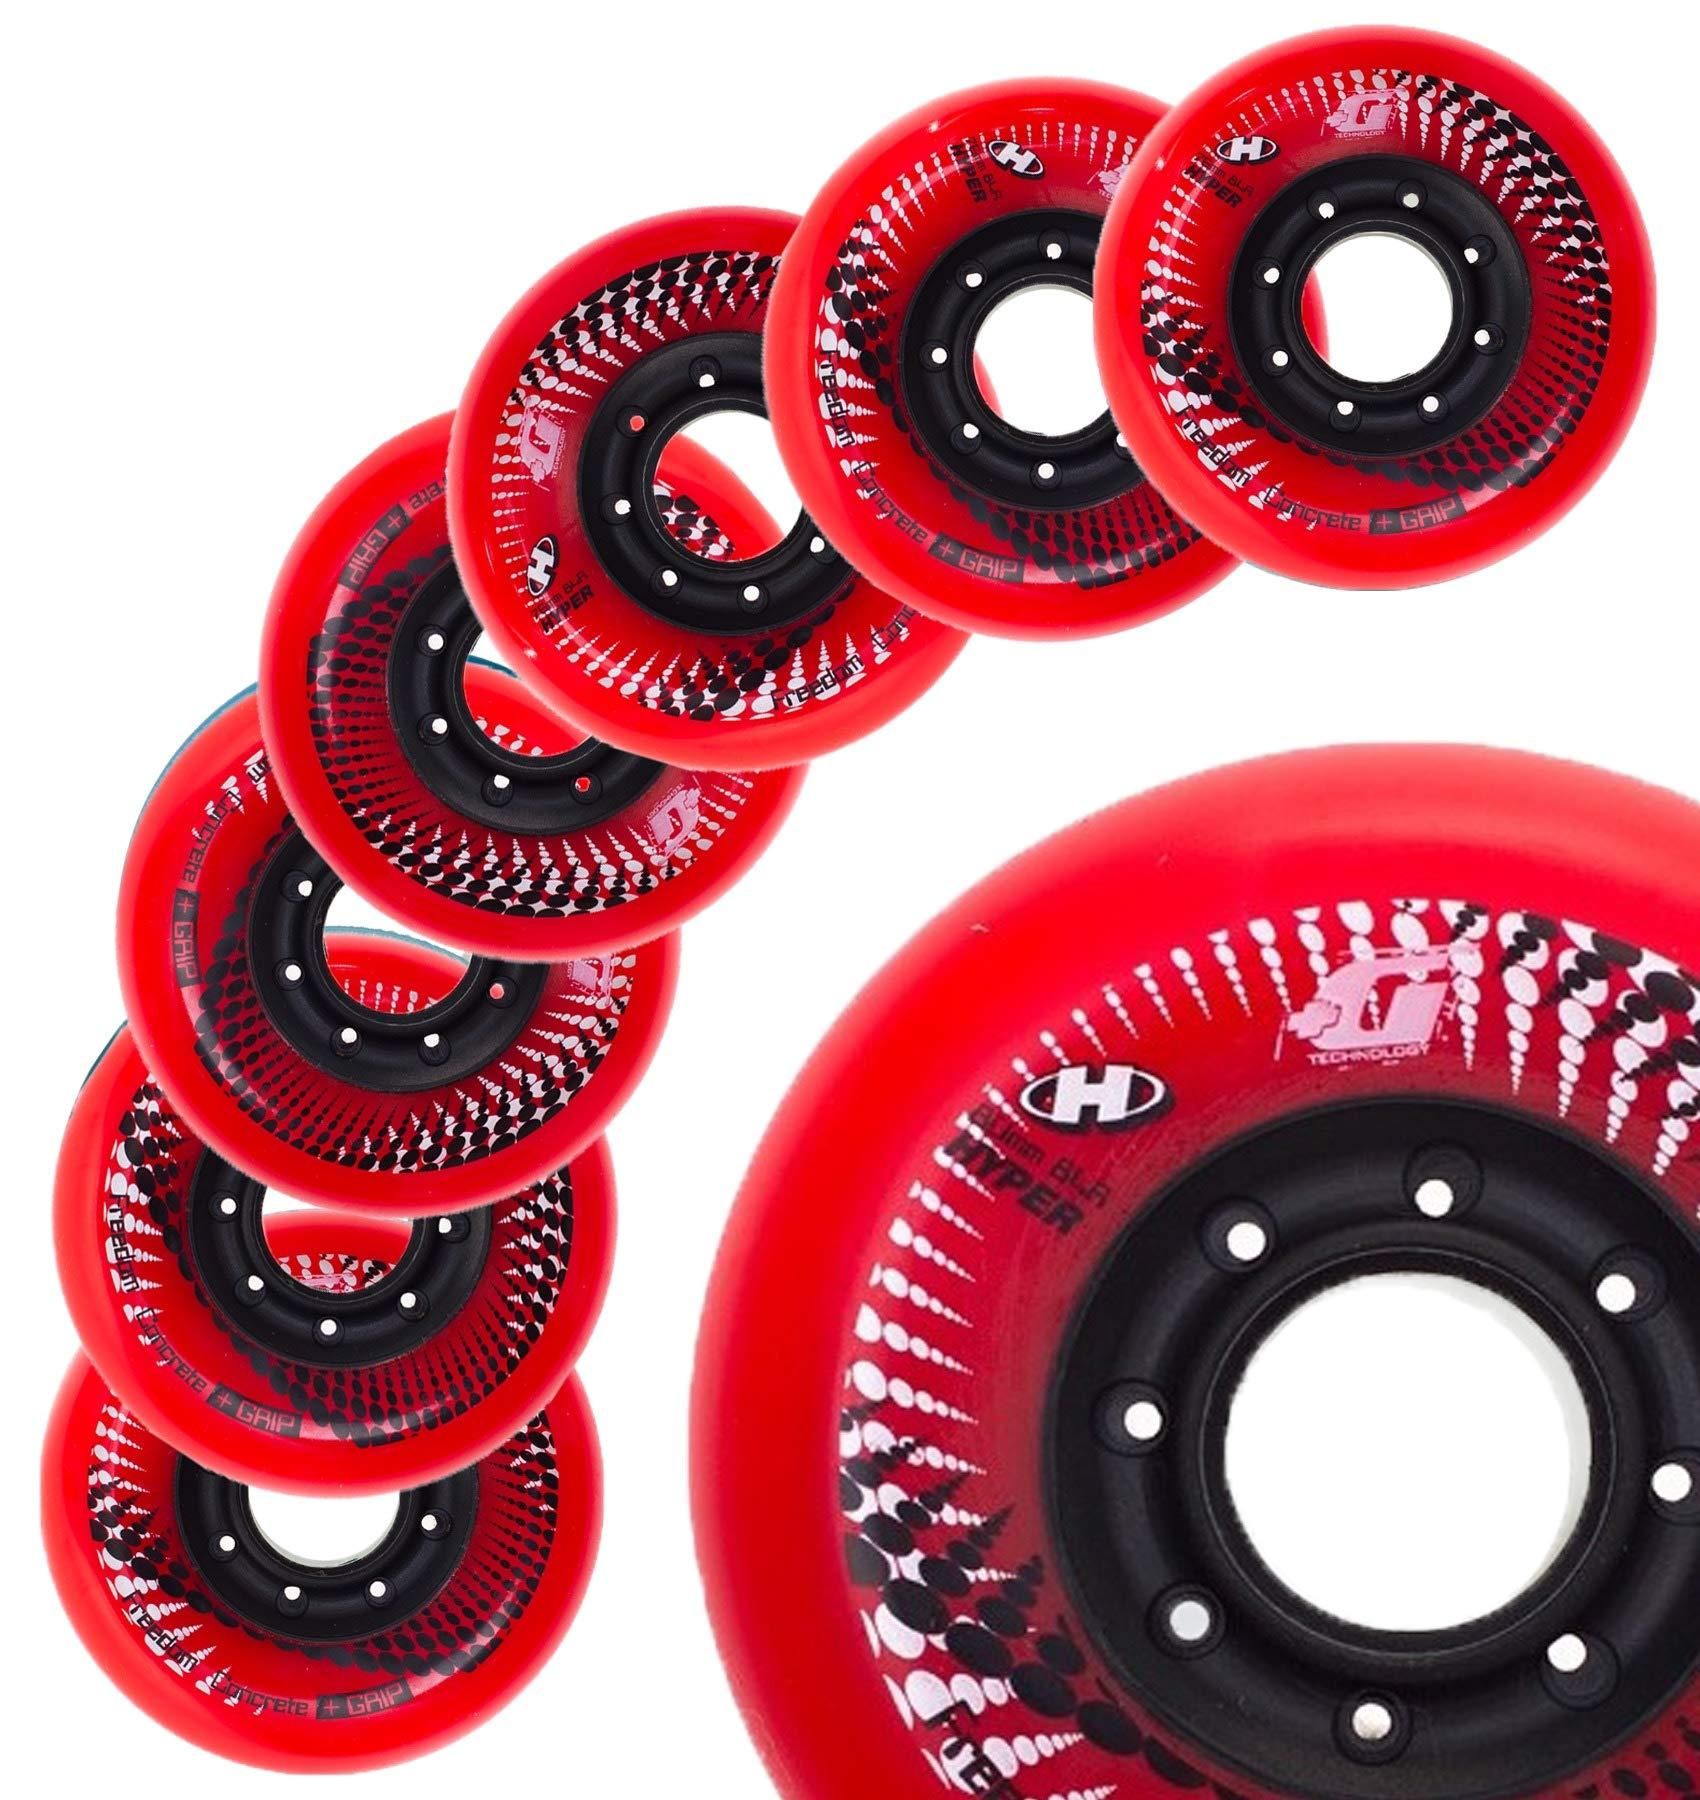 Inline Skate Wheels Hyper Concrete +G - 8 Wheels - 84A - Sizes: 72MM, 76MM, 80MM - Freeride, Slalom, Fitness, Urban - Colors: White, Black, Orange, Green, Cyan, Red (RED, 80MM)